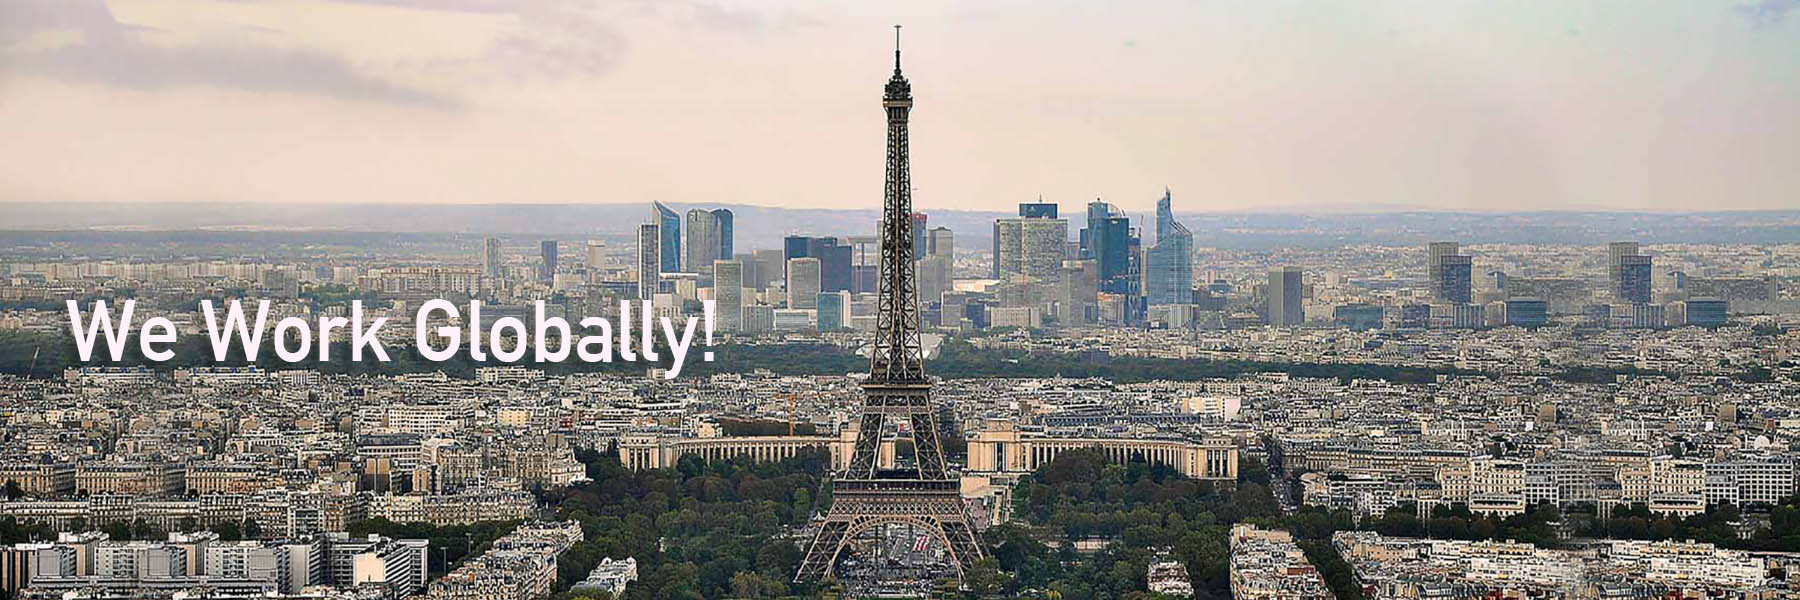 paris-we-work-globally-3×1-executive-diversity-training-slider-images